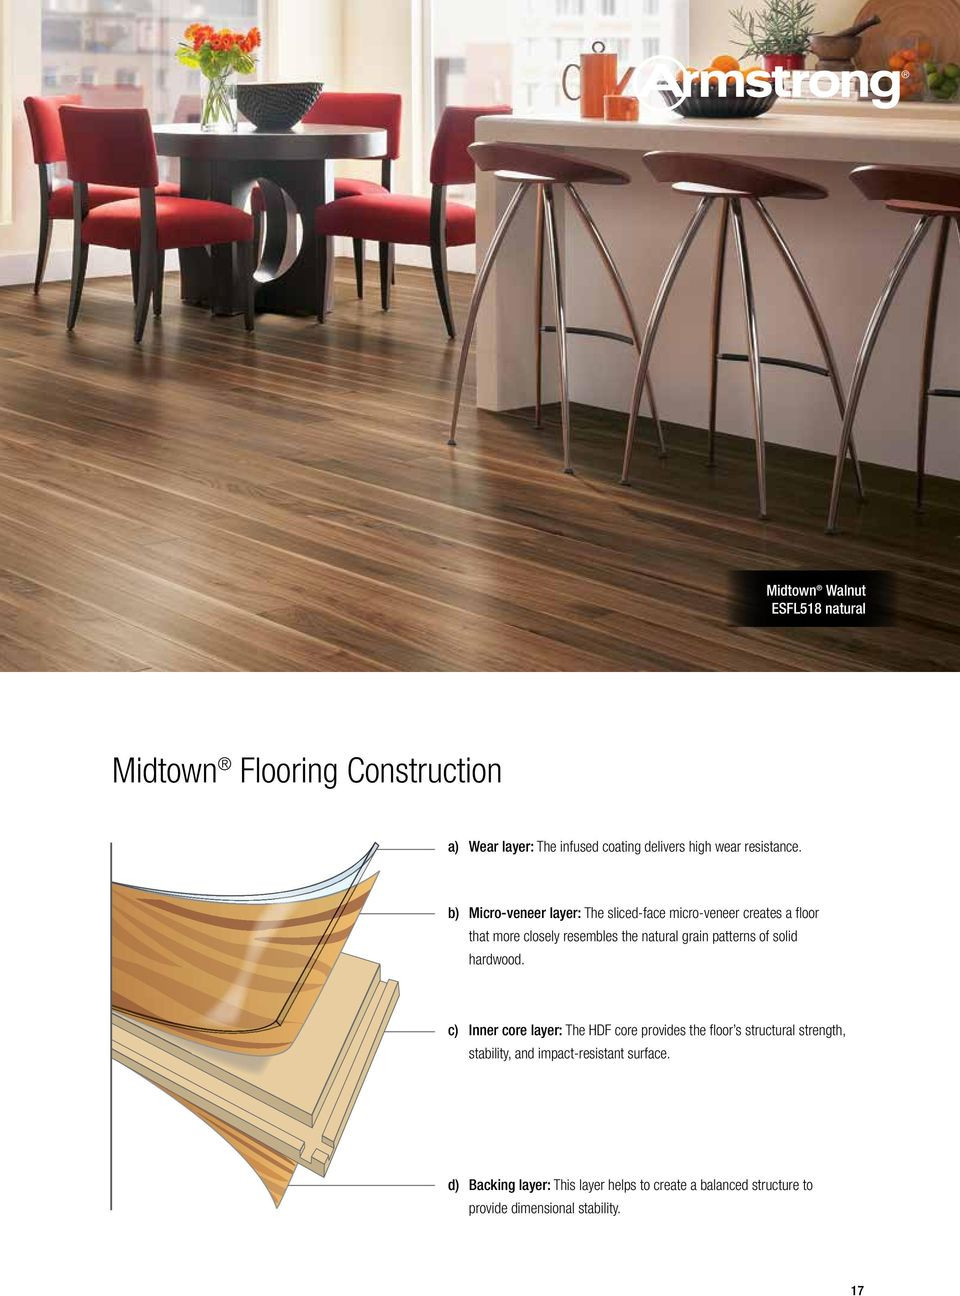 bostitch pneumatic hardwood floor stapler of performance plus midtown pdf within b micro veneer layer the sliced face micro veneer creates a 18 midtown hardwood custom flooring